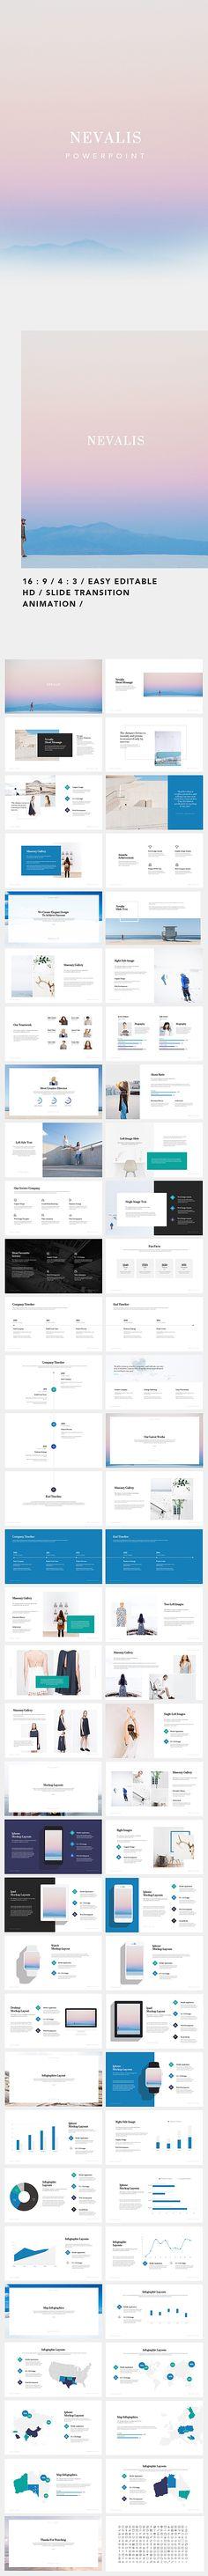 orelo business proposal powerpoint template | business proposal, Presentation templates